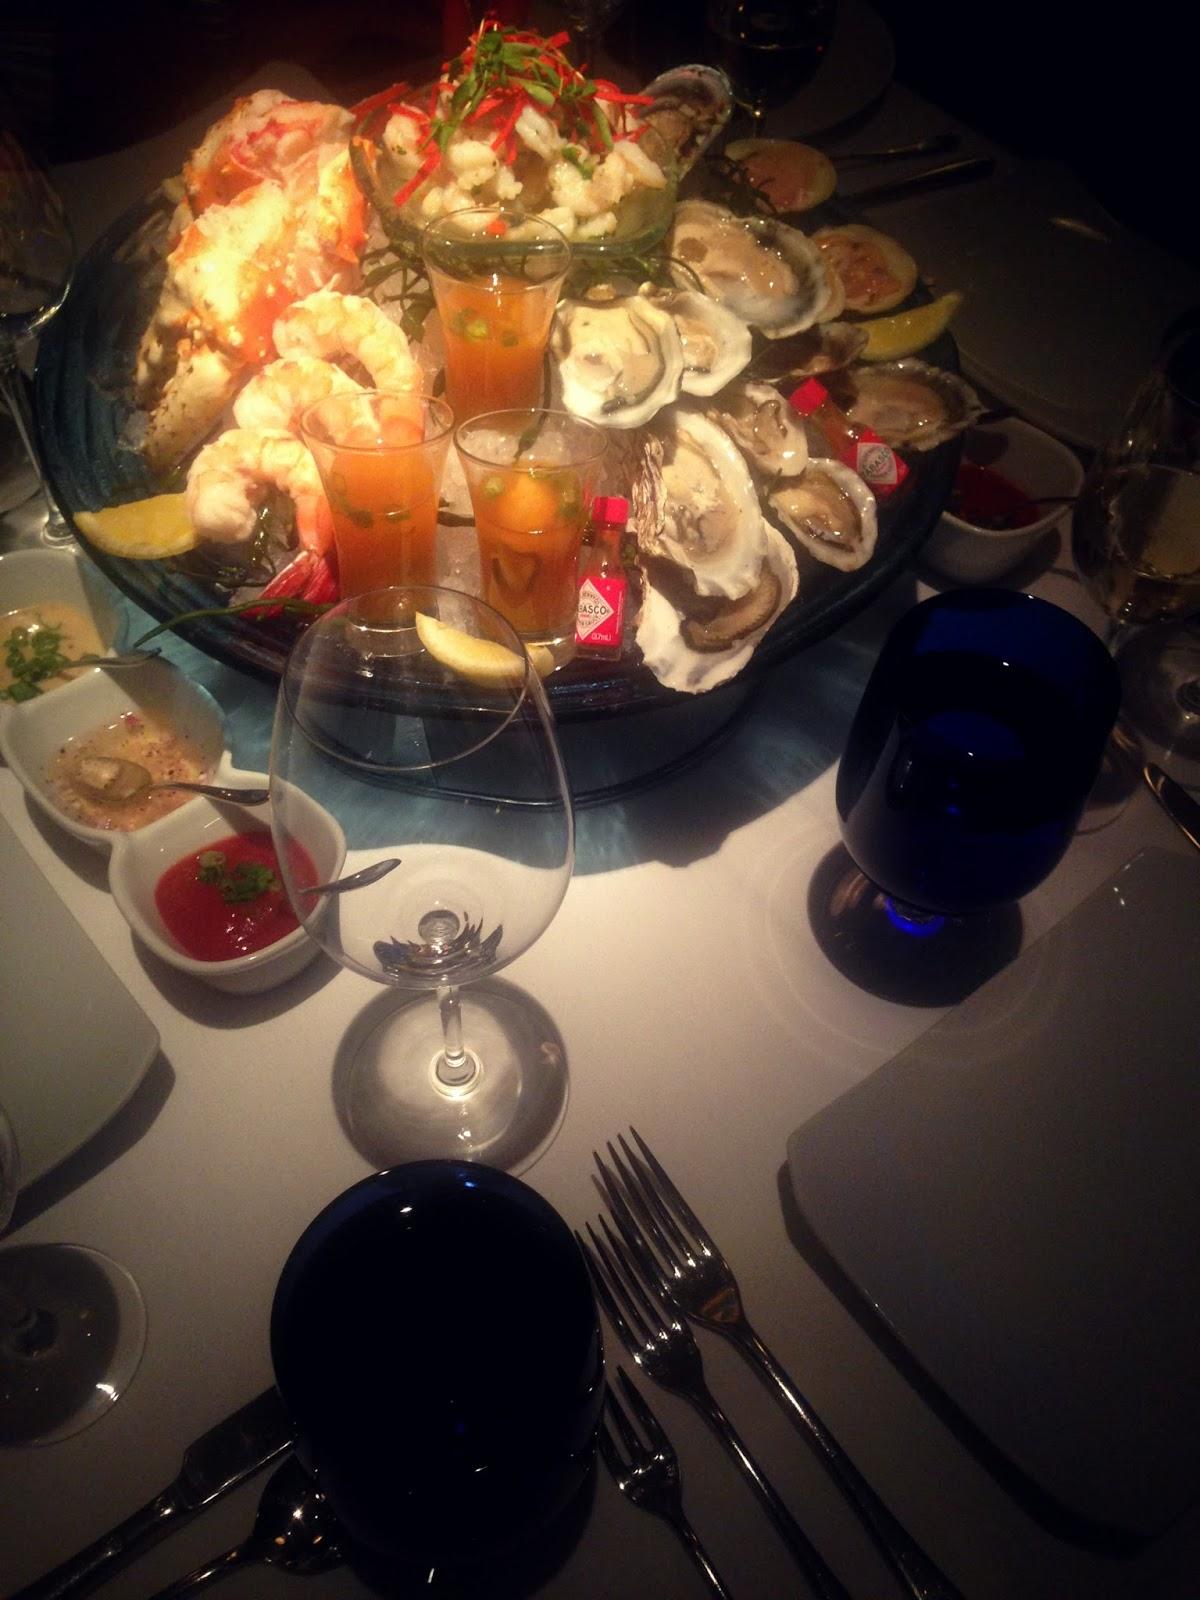 Venetian Hotel Las Vegas Aquaknox divine seafood Restaurant + bar